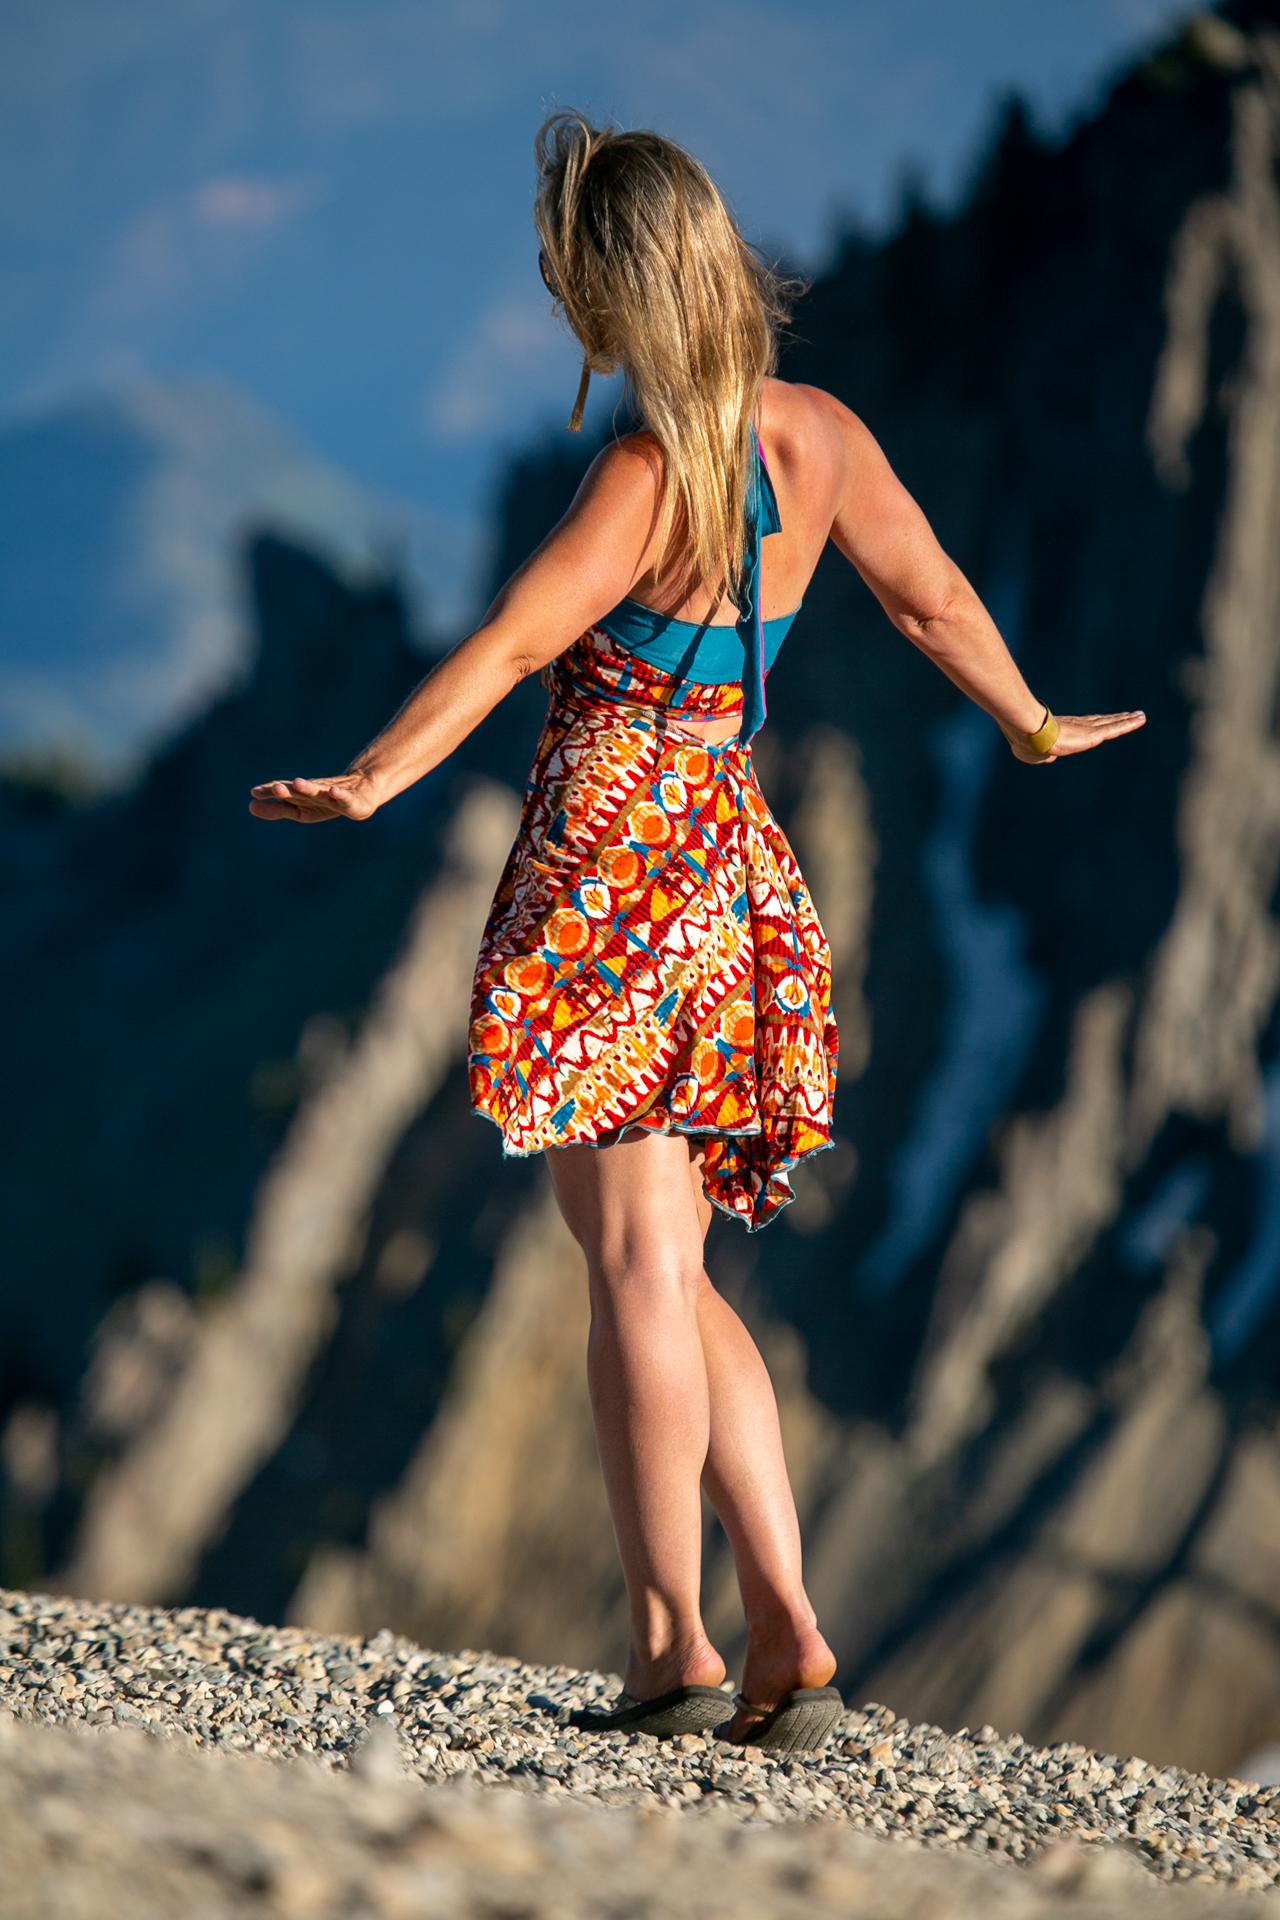 En trend fashion designer Autumn Teneyl wearing a festive halter dress on top on a California mountain.